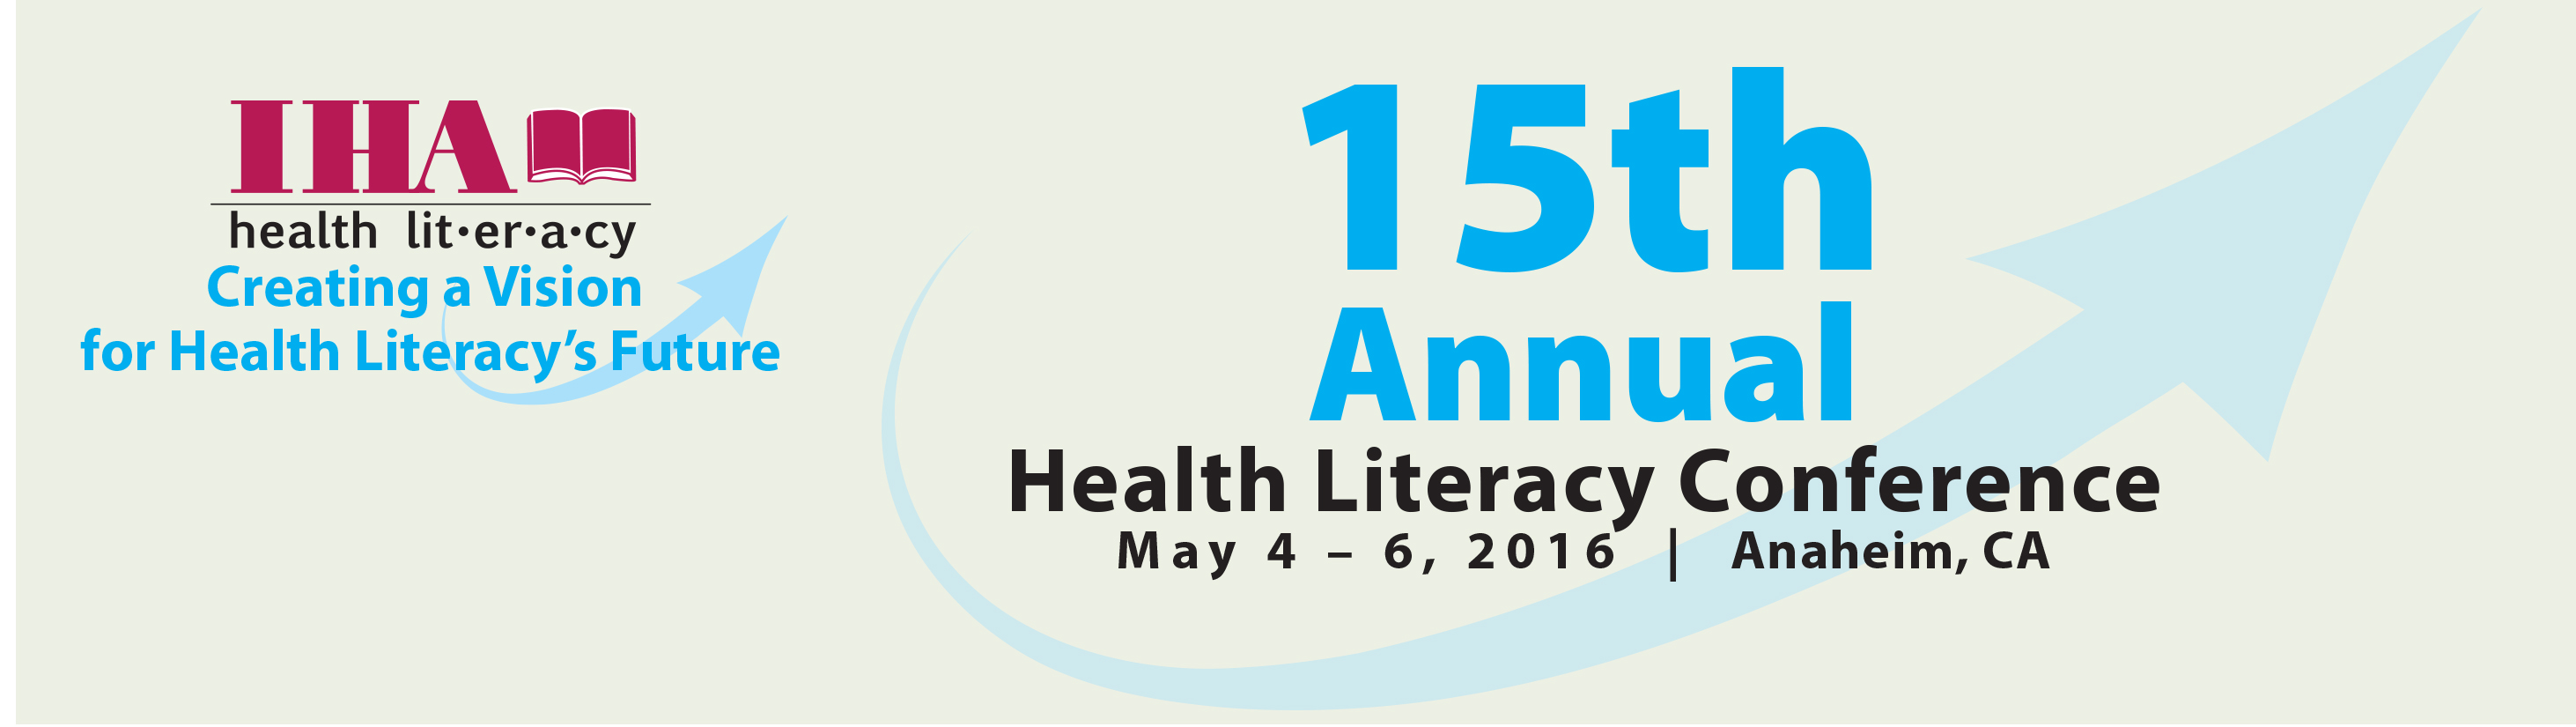 IHA's Health Literacy Conference 2016